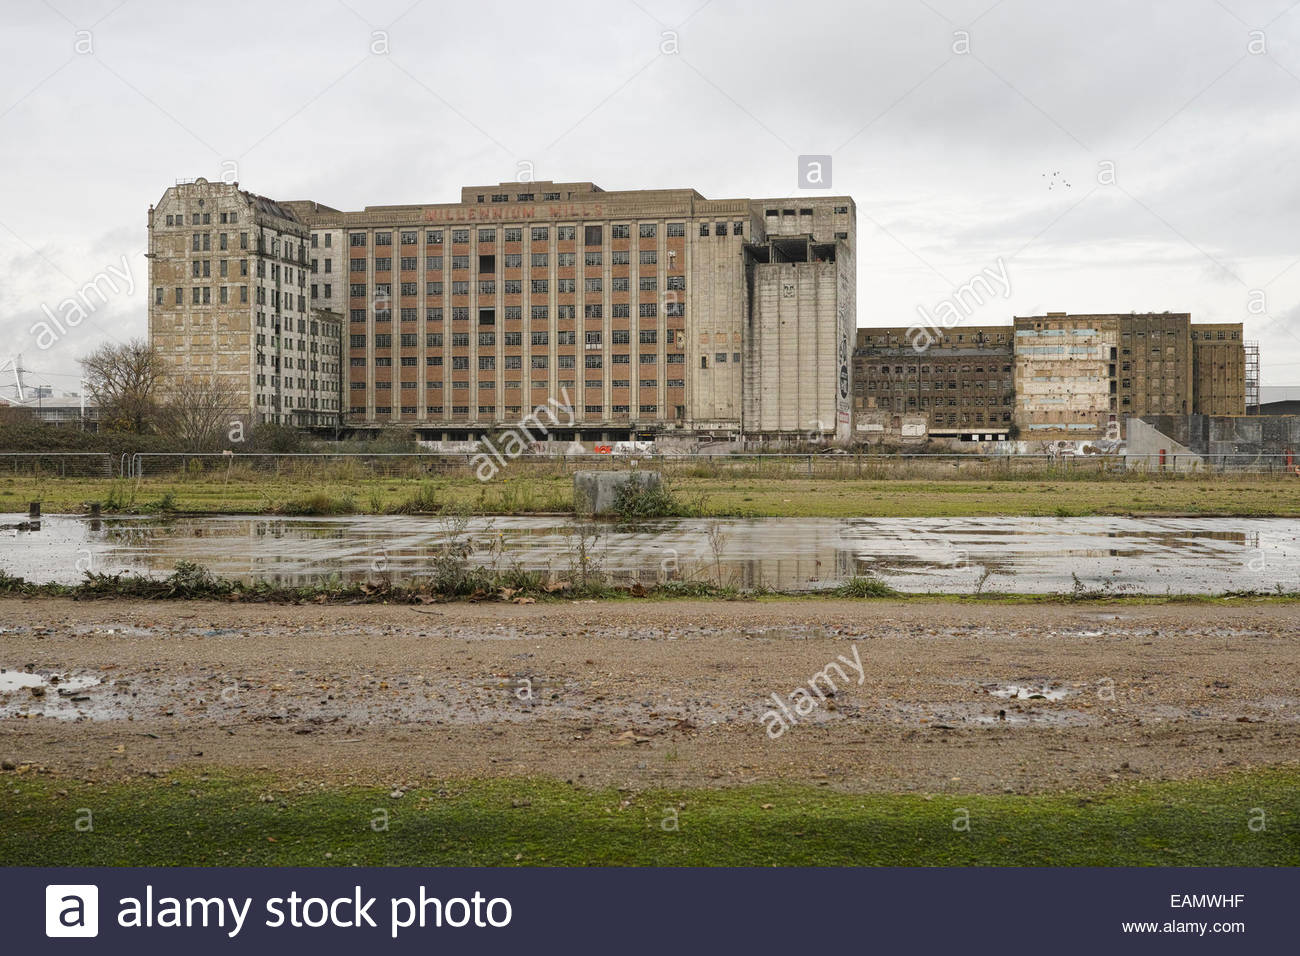 the-derelict-millennium-mills-building-a